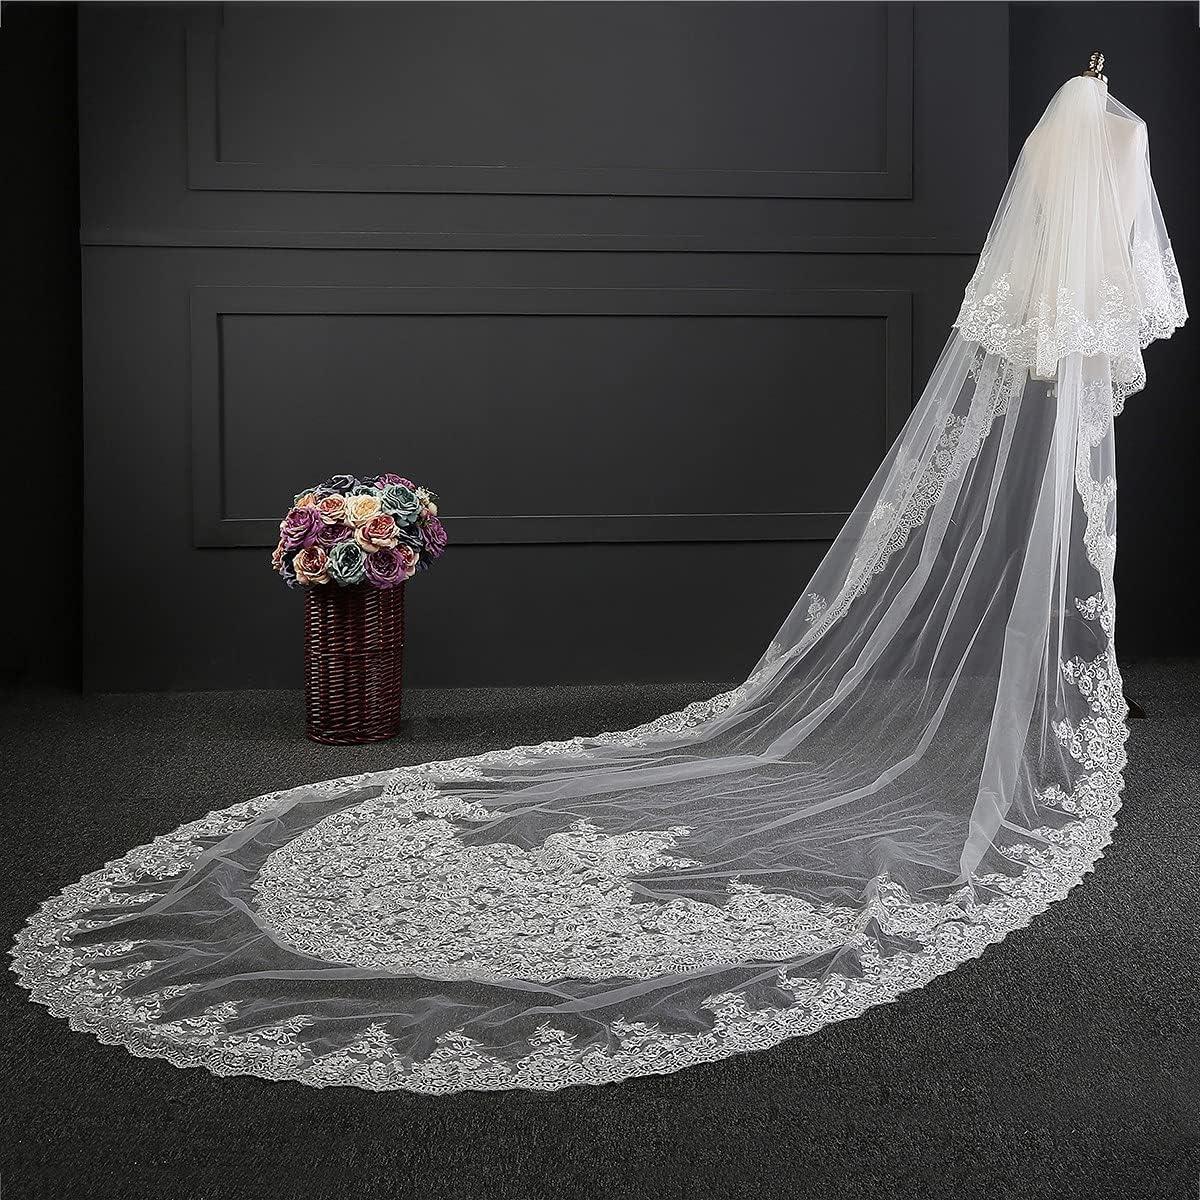 JZJZ Women's Bridal Wedding Veil 2 Tier Tail Cathedral Big Max 67% OFF Dedication